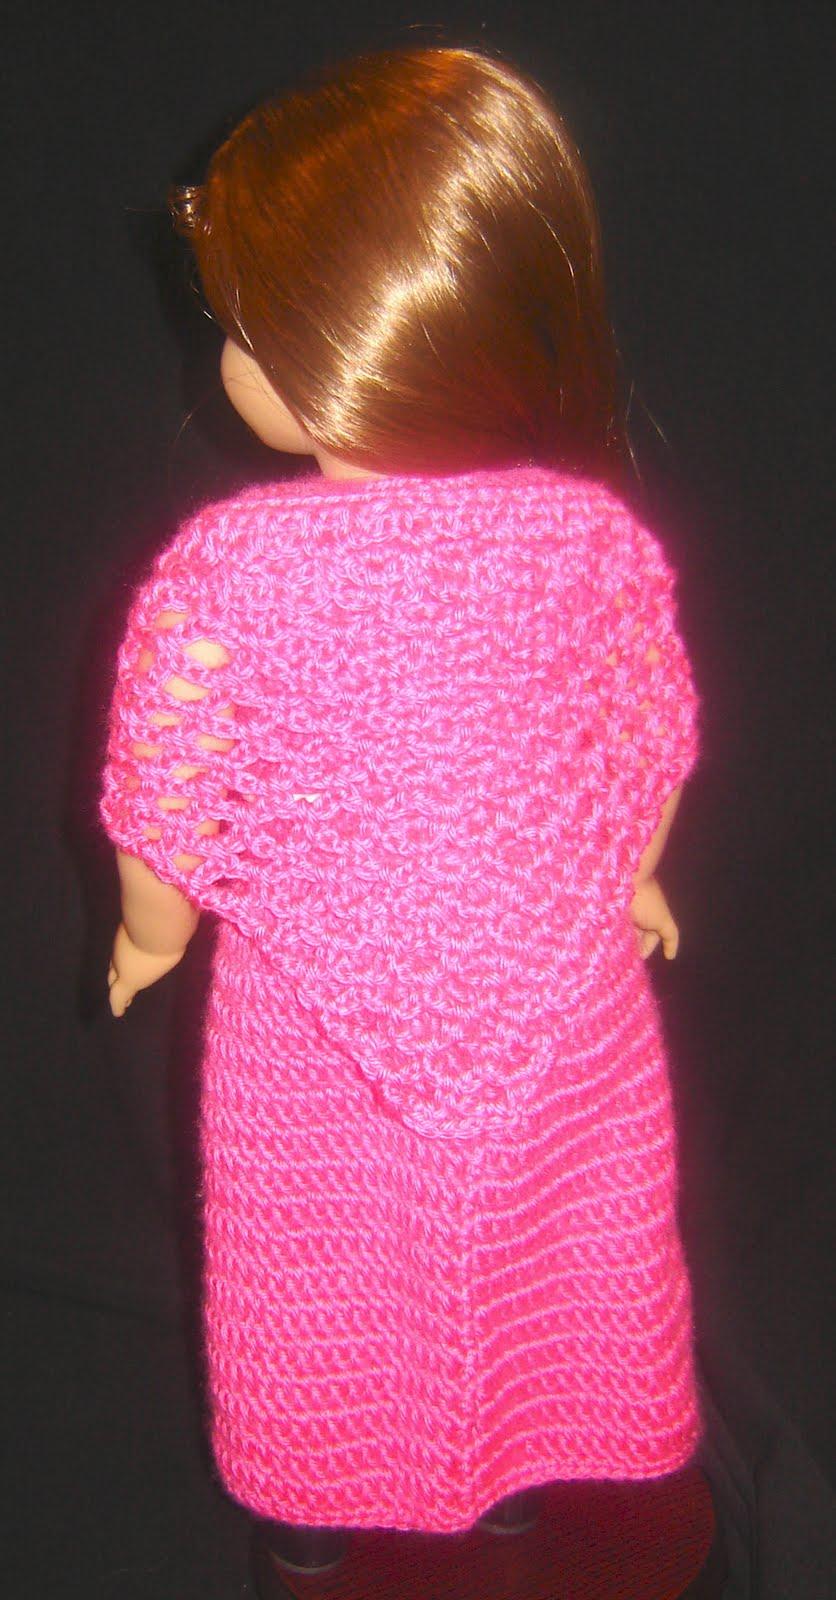 Bizzy Crochet: Evening Dress w/ Shawl Pattern- 18